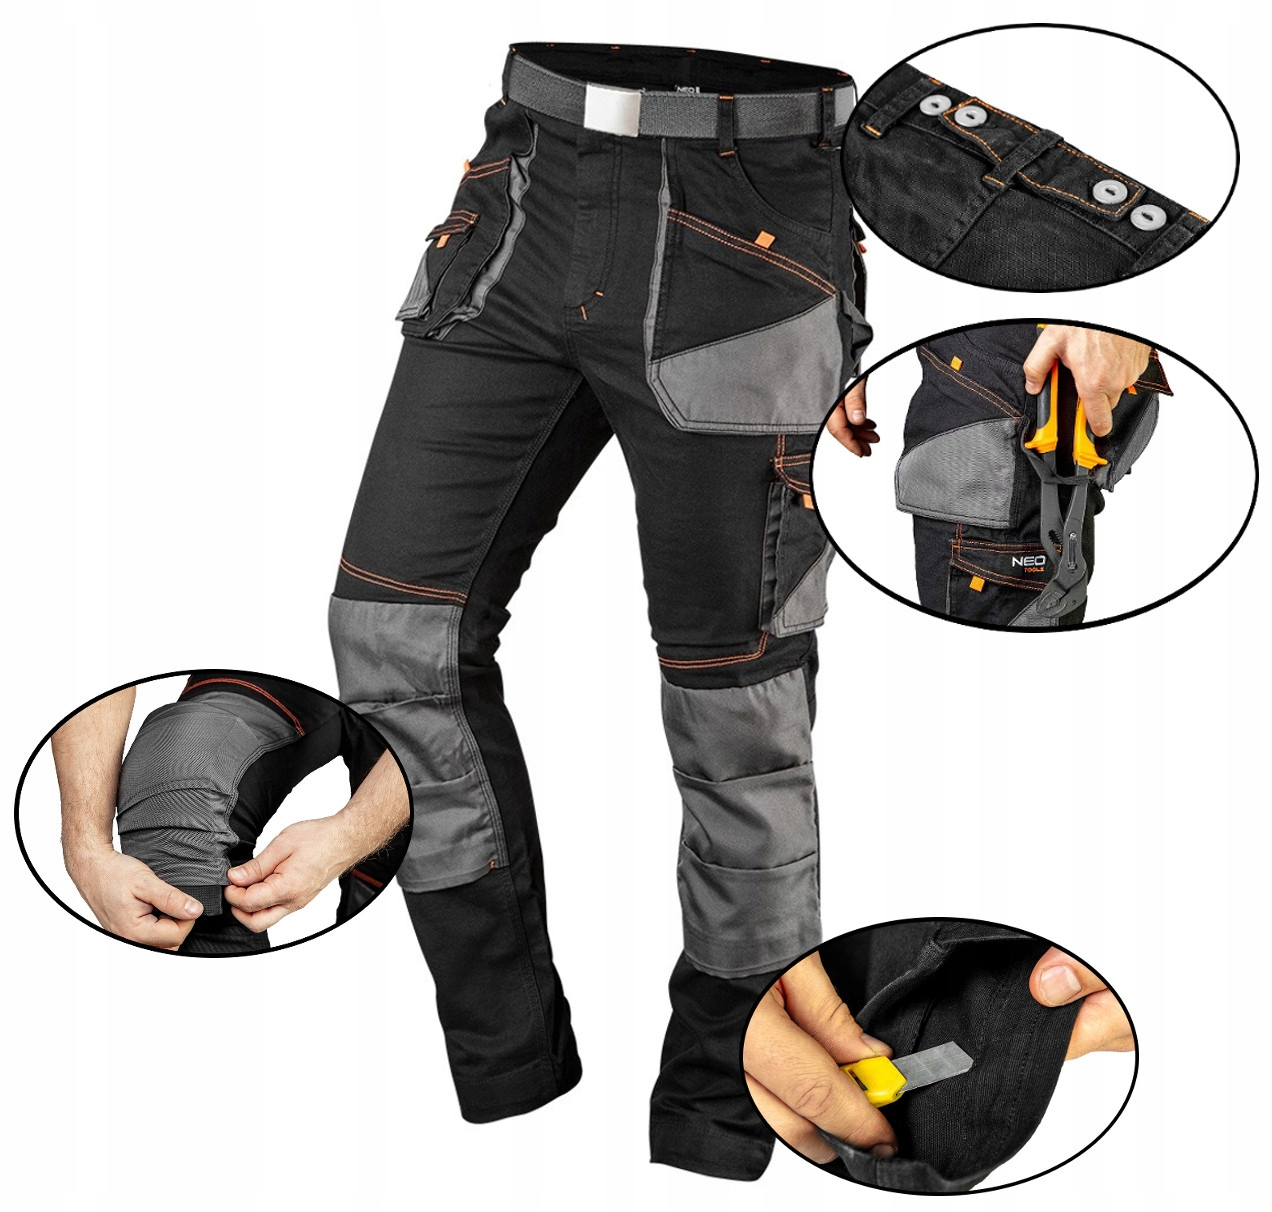 Нео работающие штаны HD Slim Monterskie R.l пояс